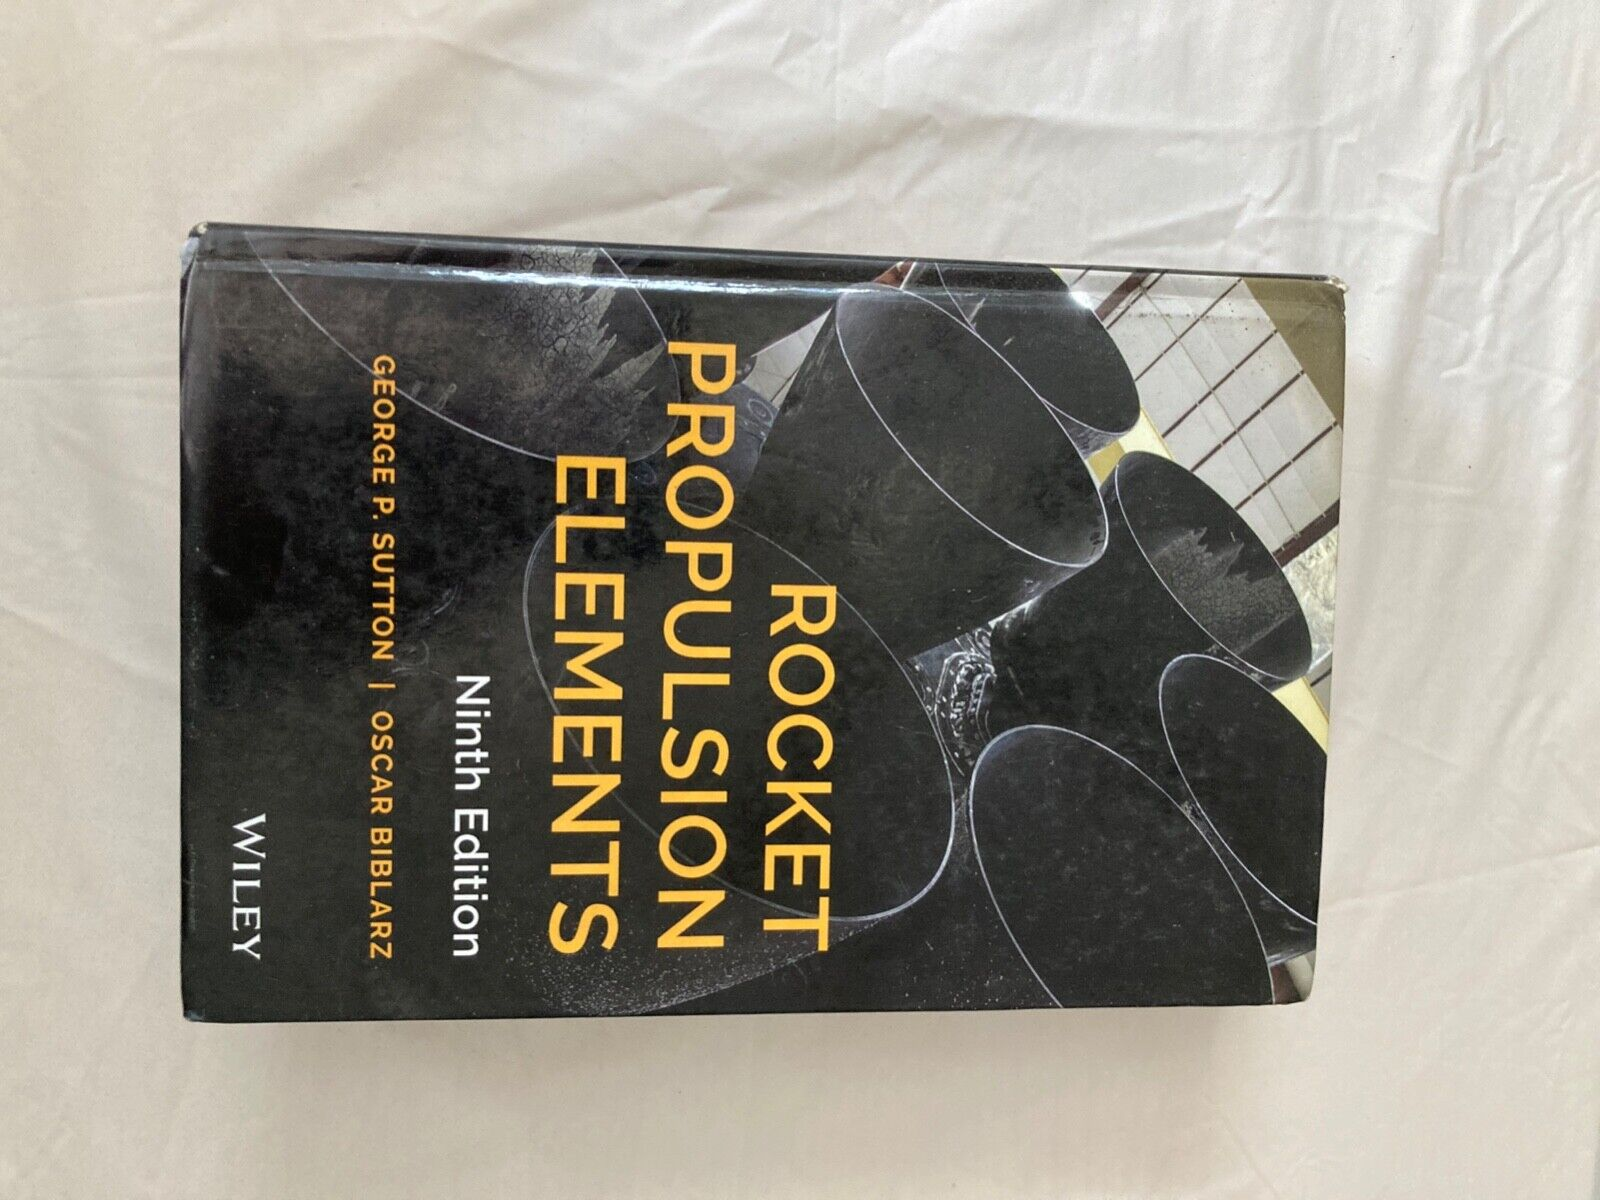 Rocket Propulsion Elements By Oscar Biblarz And George P. Sutton 2017,... - $59.00